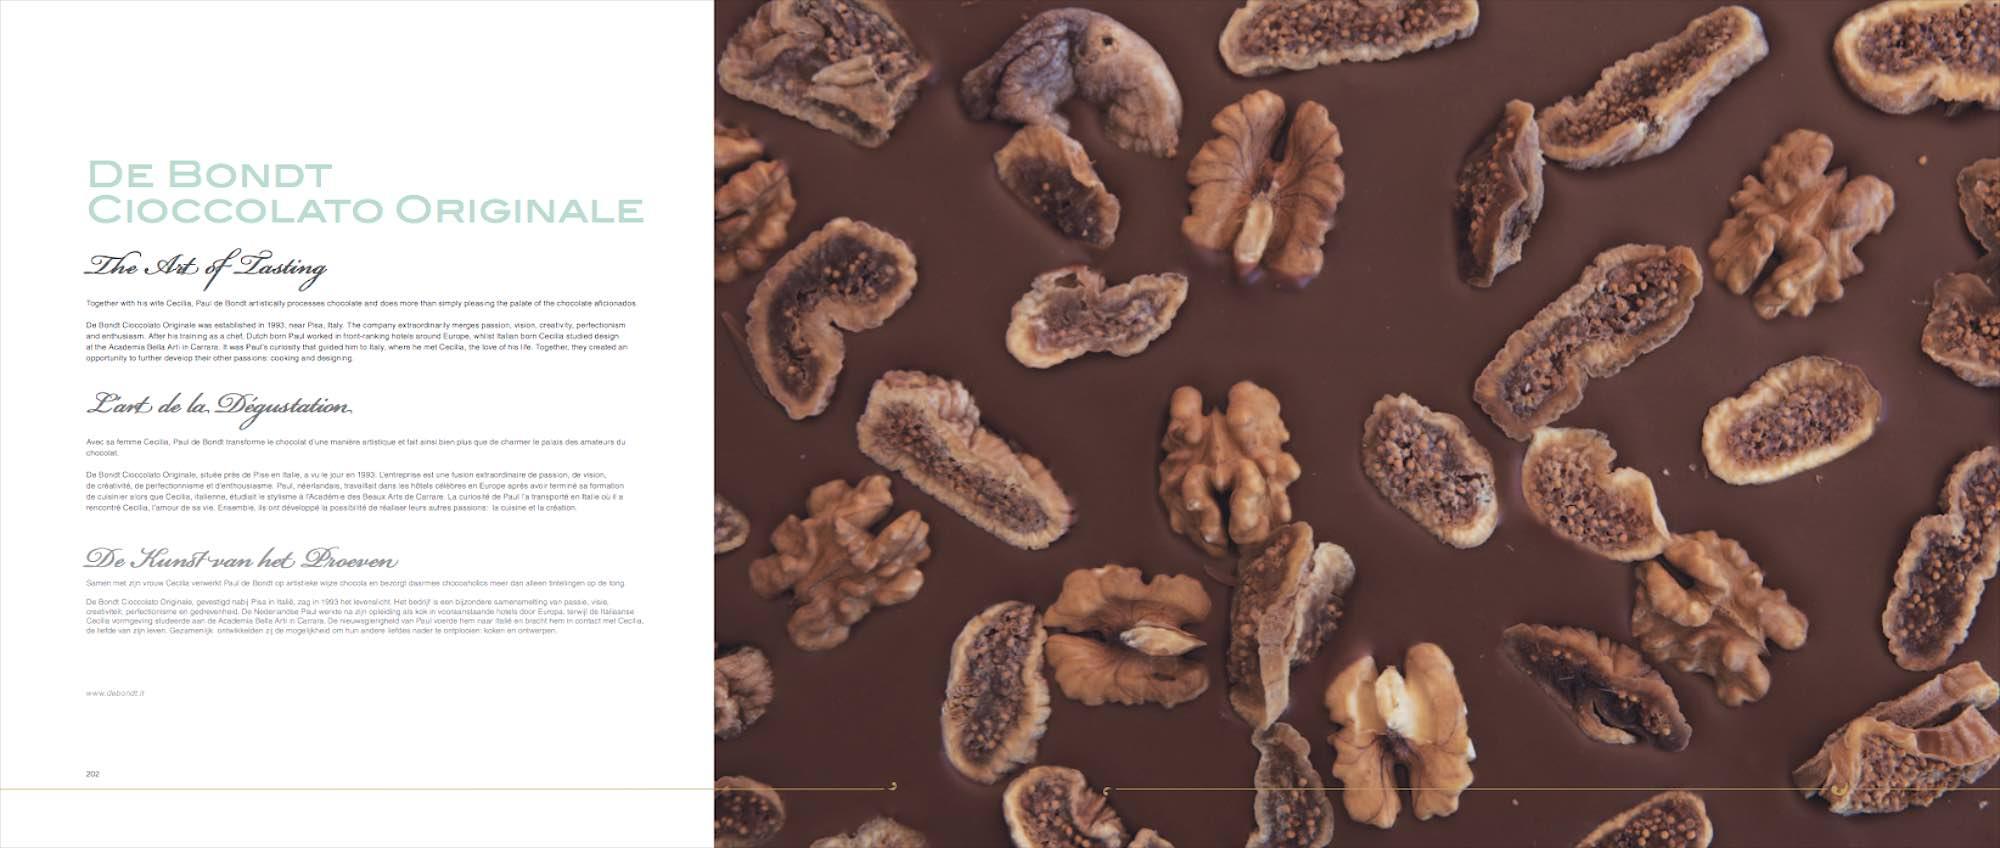 Handmade a book on luxury handmade brands